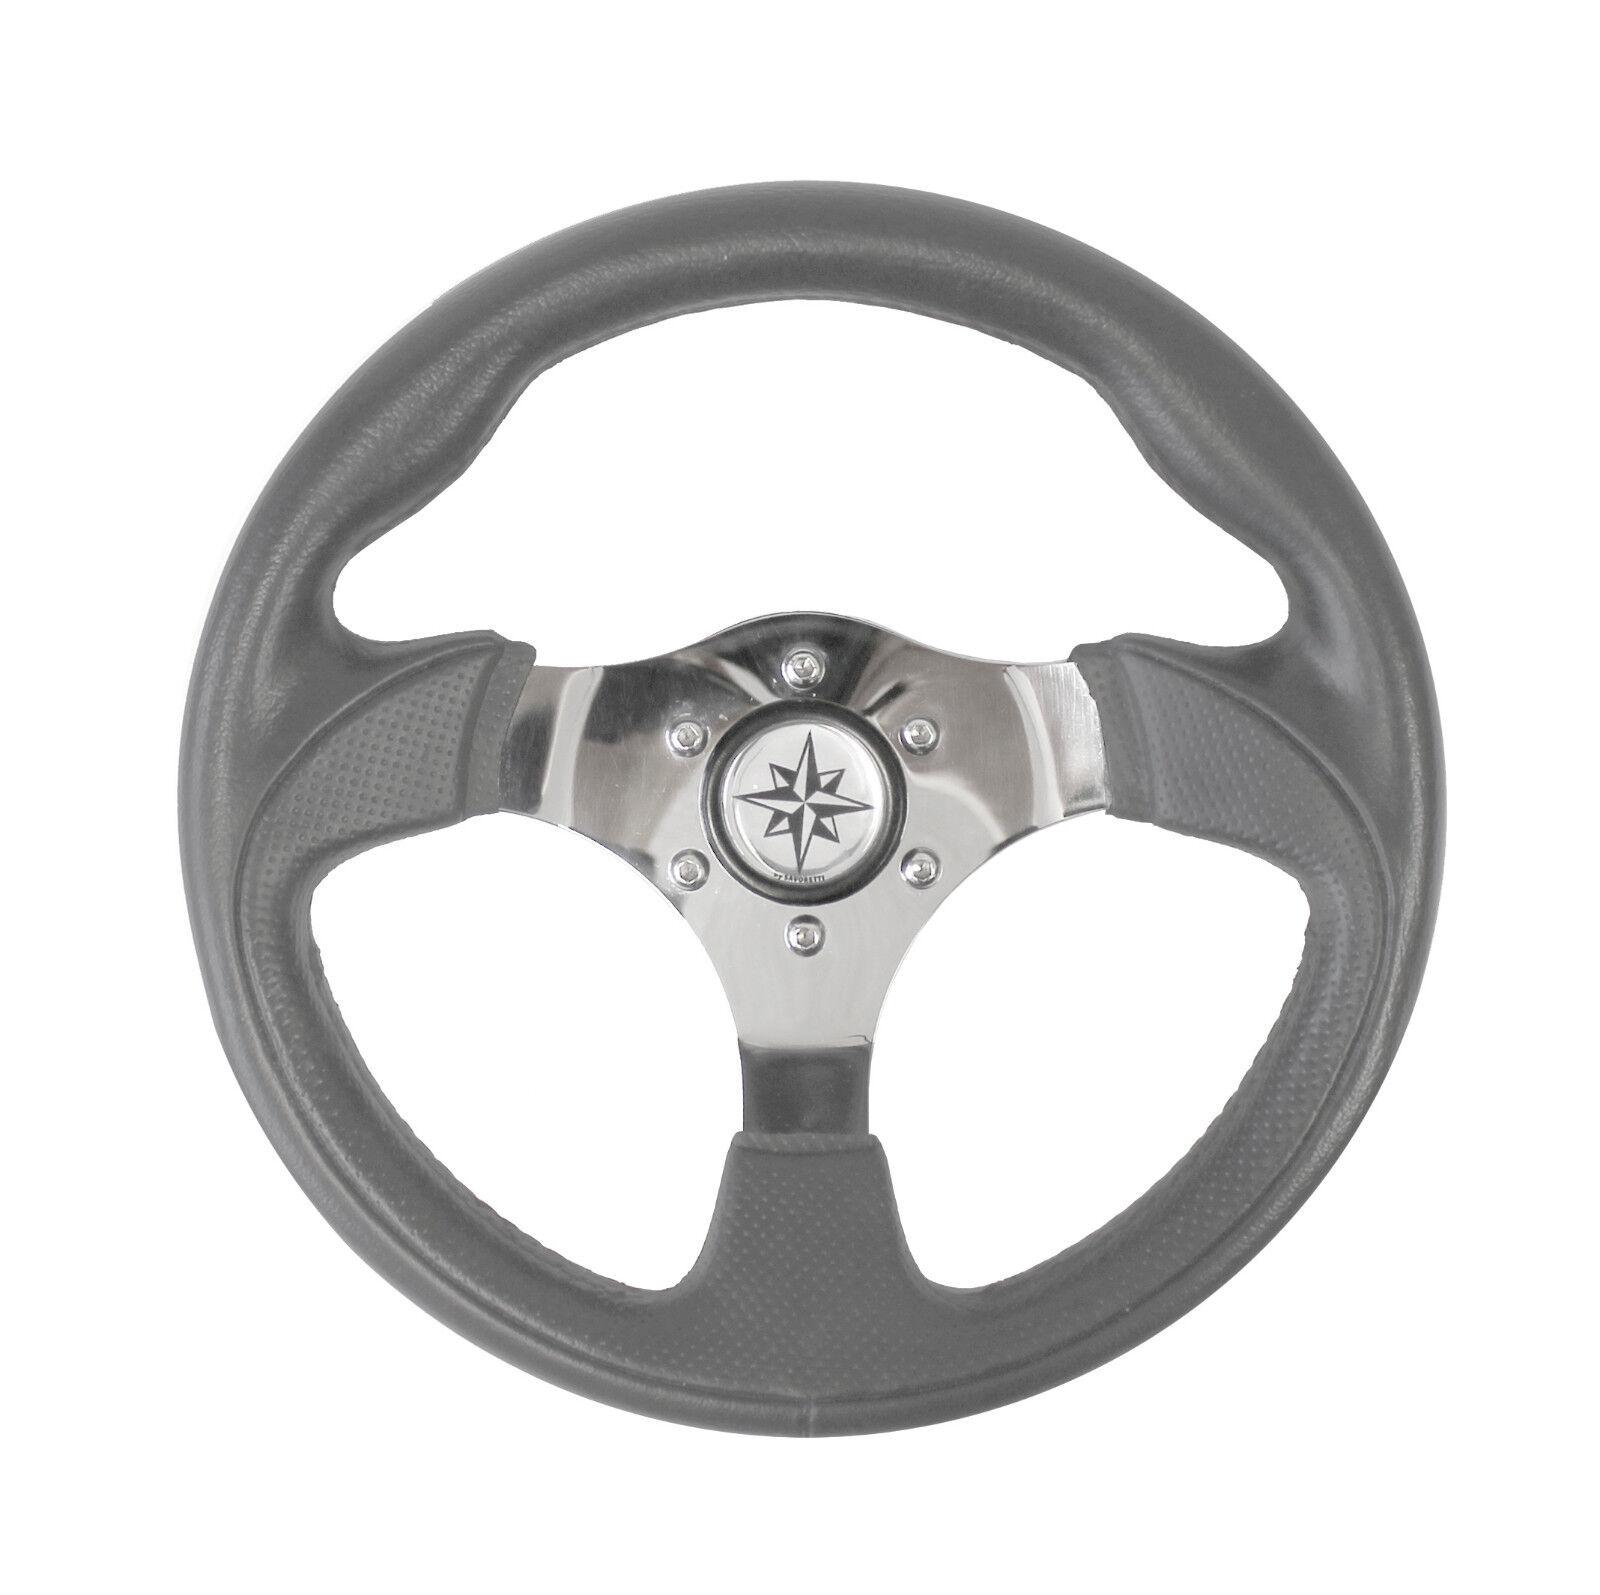 Steuerrad für SportStiefele 30cm Edelstahl grau Lenkrad MotorStiefel Steuer Stiefel